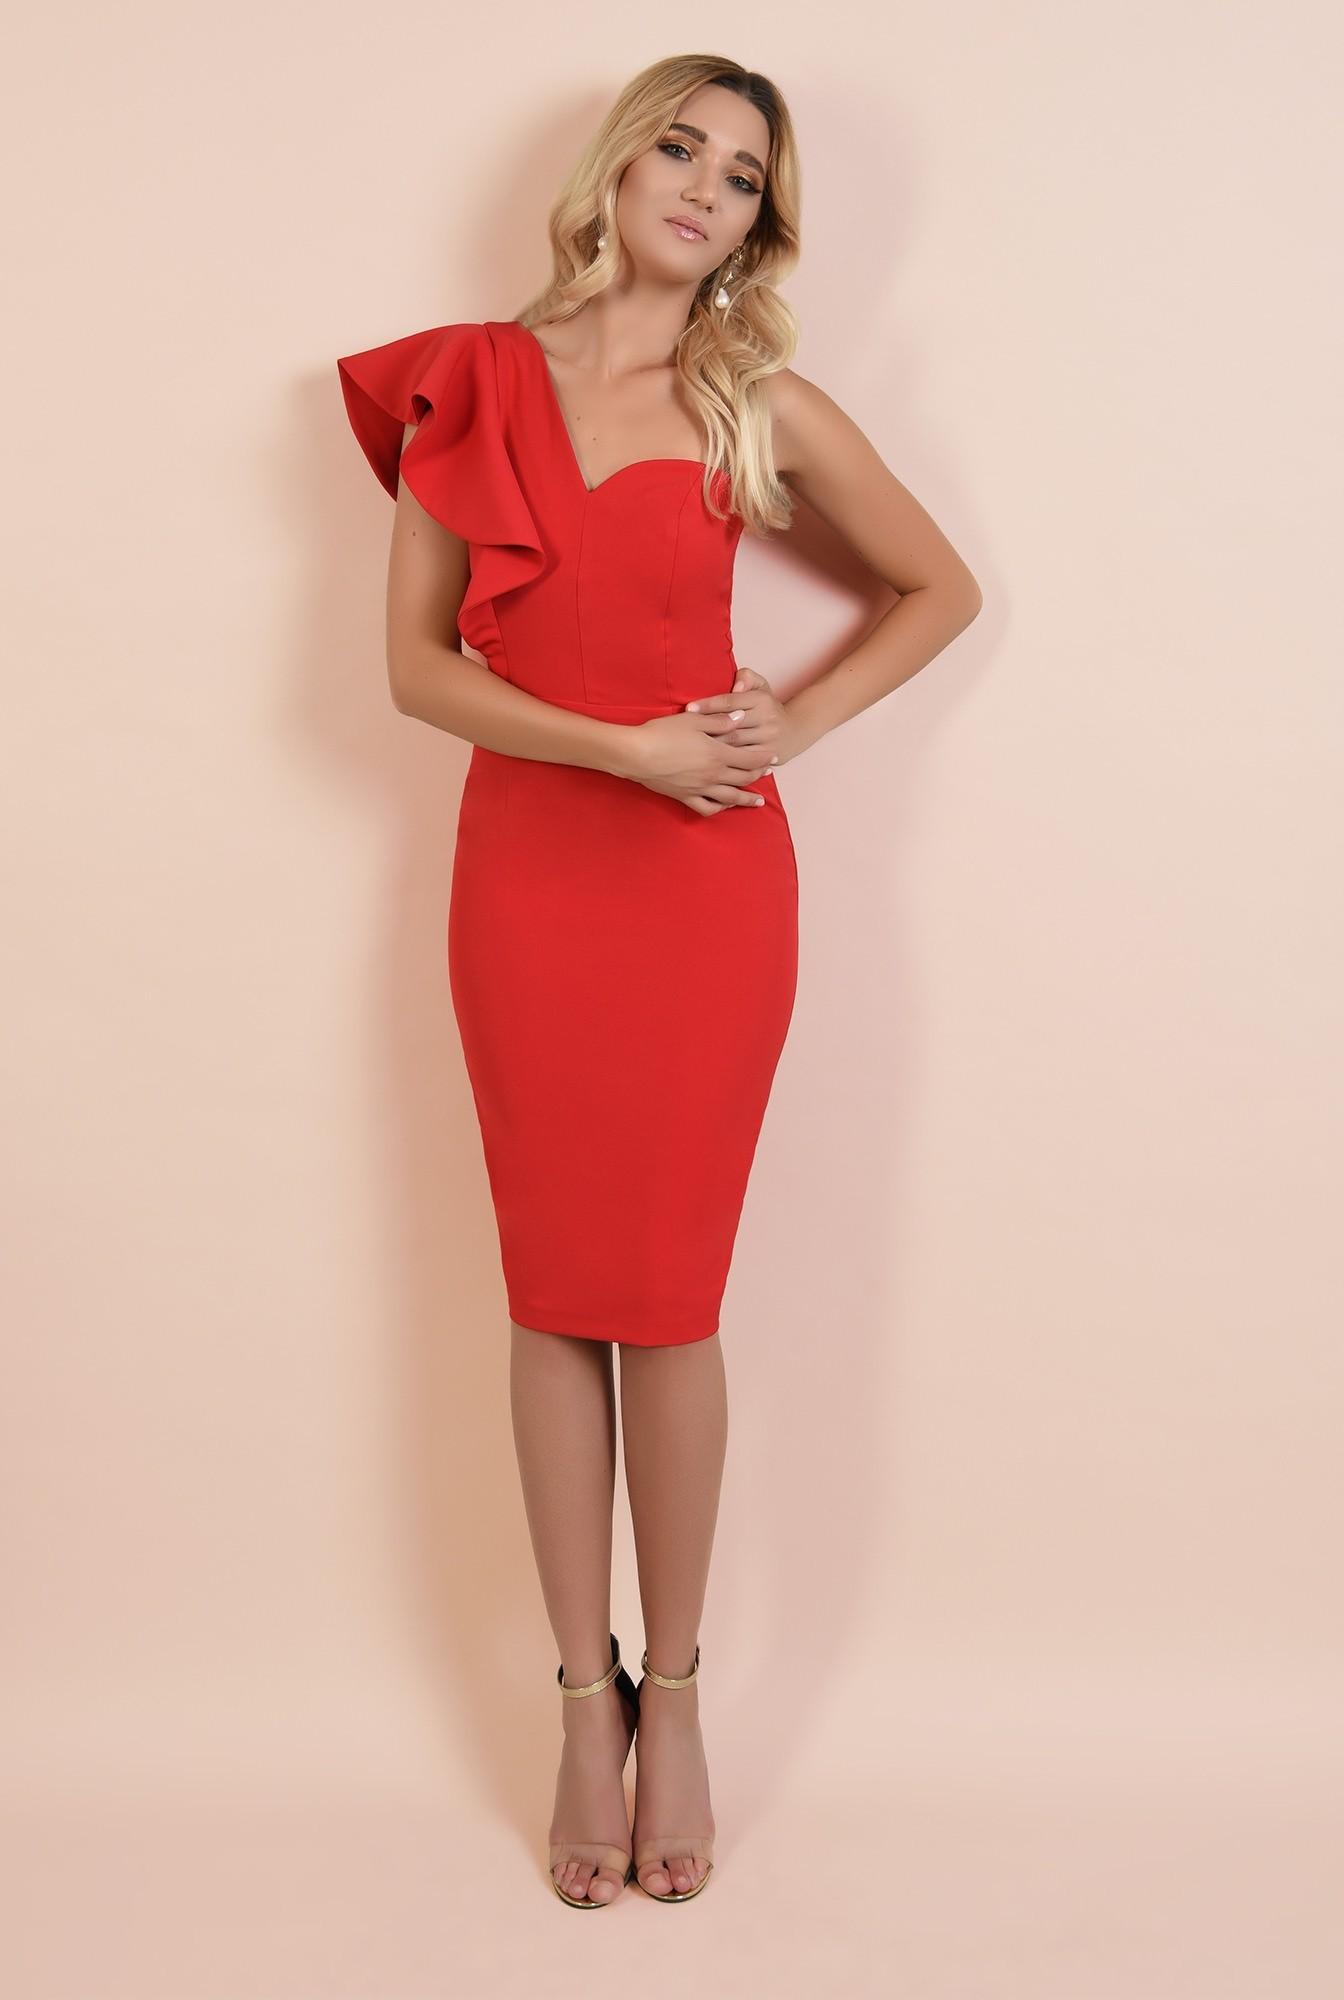 3 - 360 - rochie rosie, de ocazie, midi, conica, decolteu inima